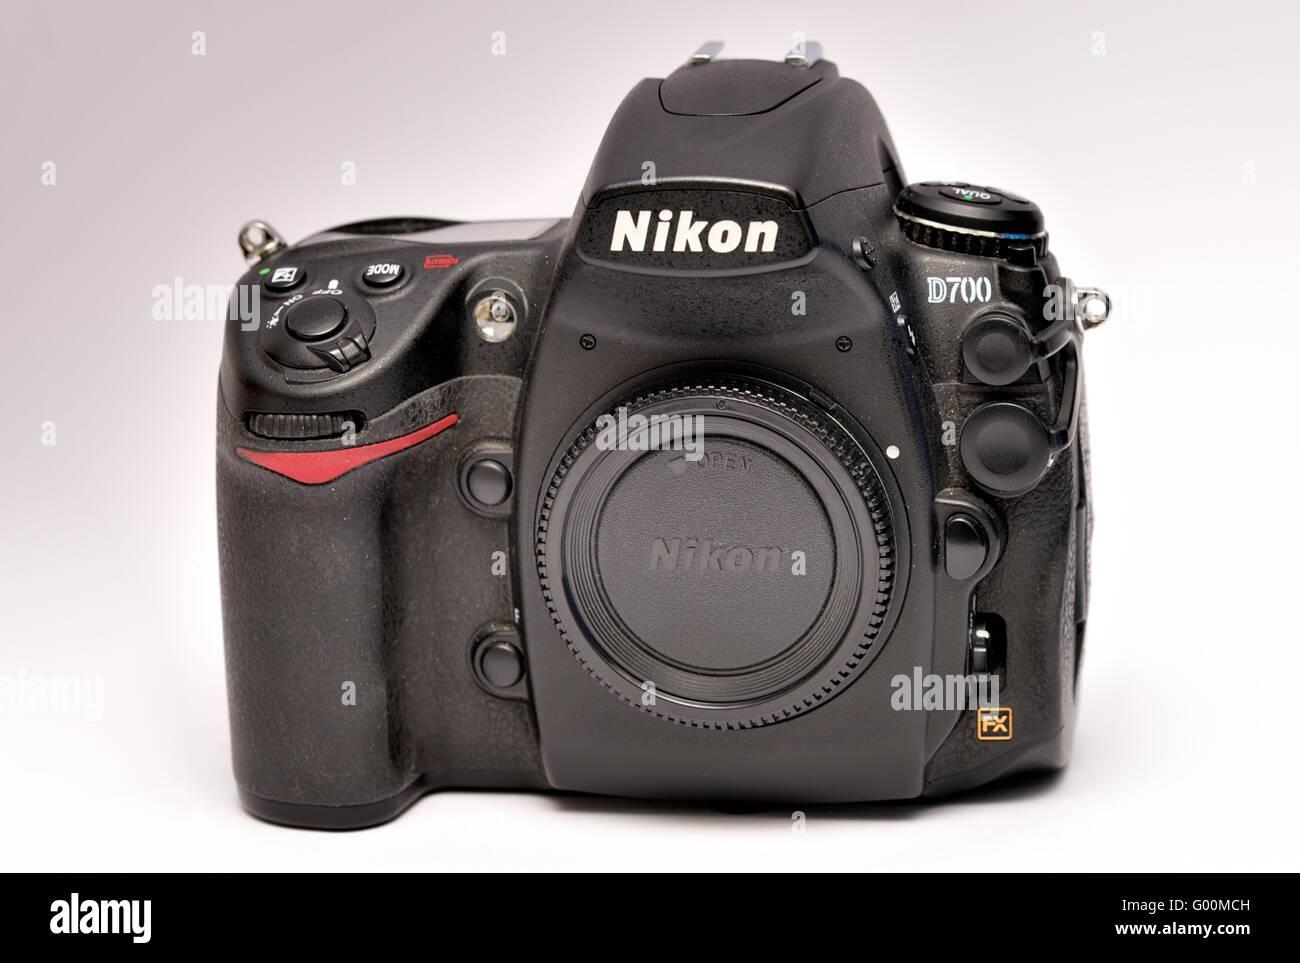 A Nikon D700 Digital SLR camera - Stock Image